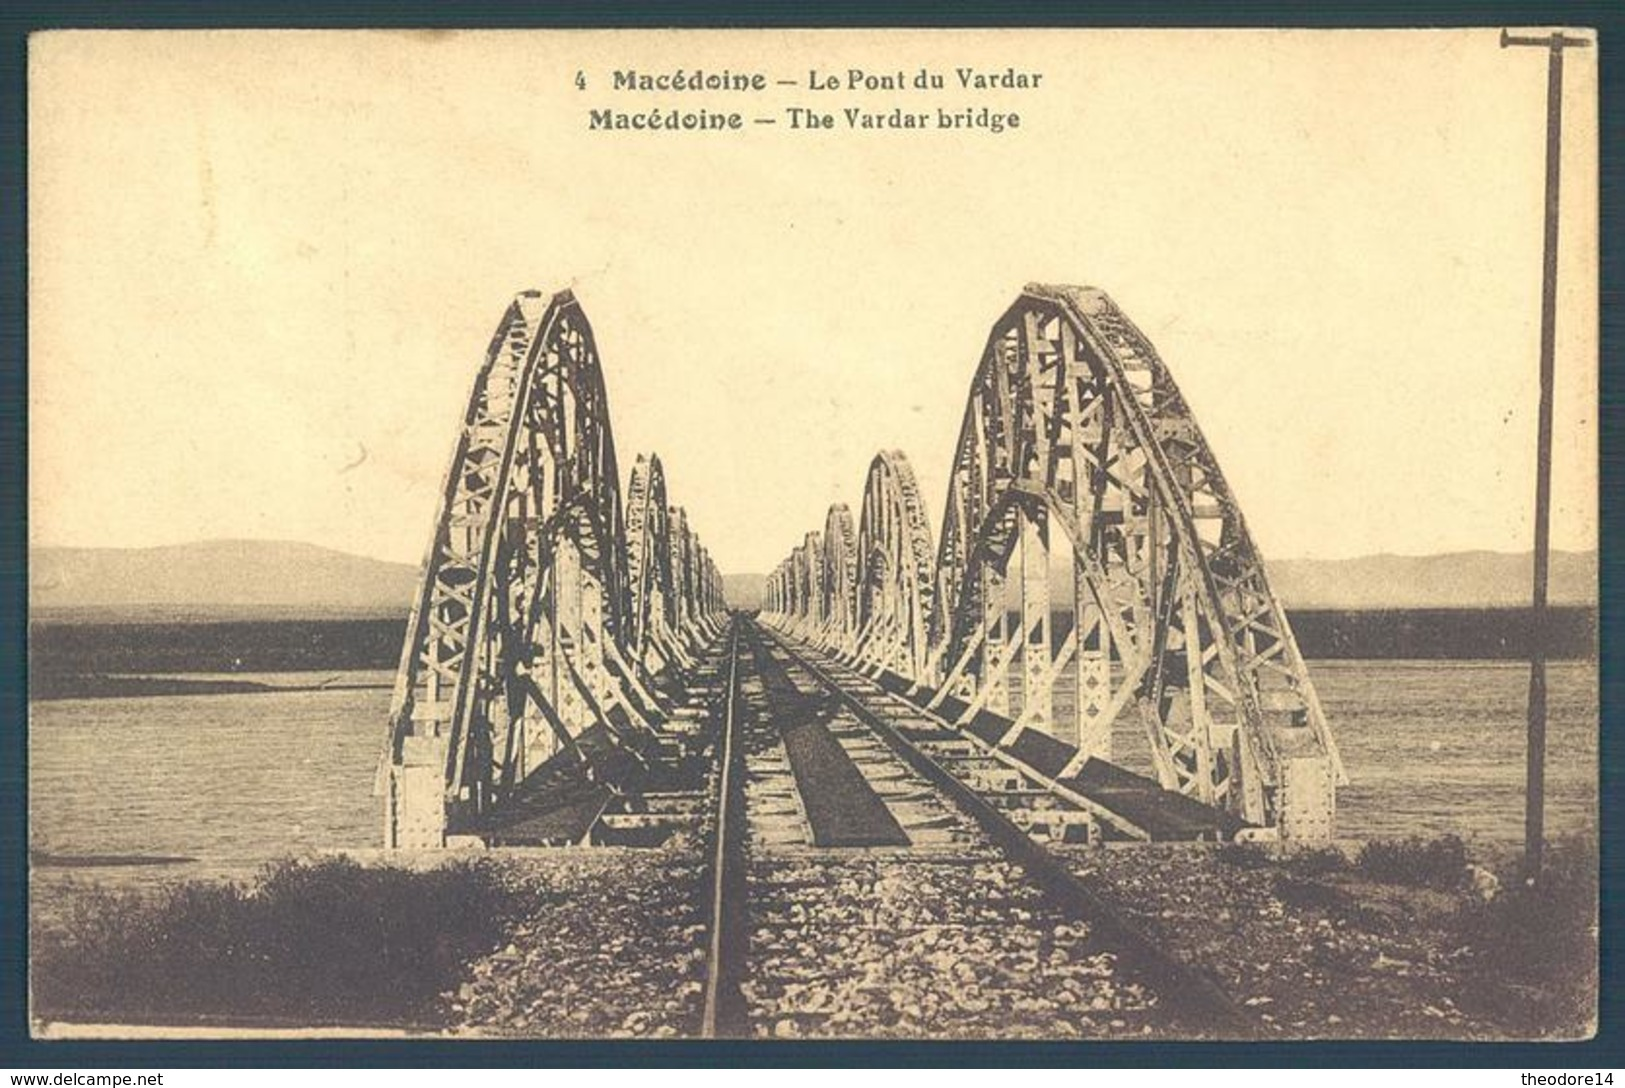 Macedoine Macedonia Le Pont Du Vardar - Macédoine